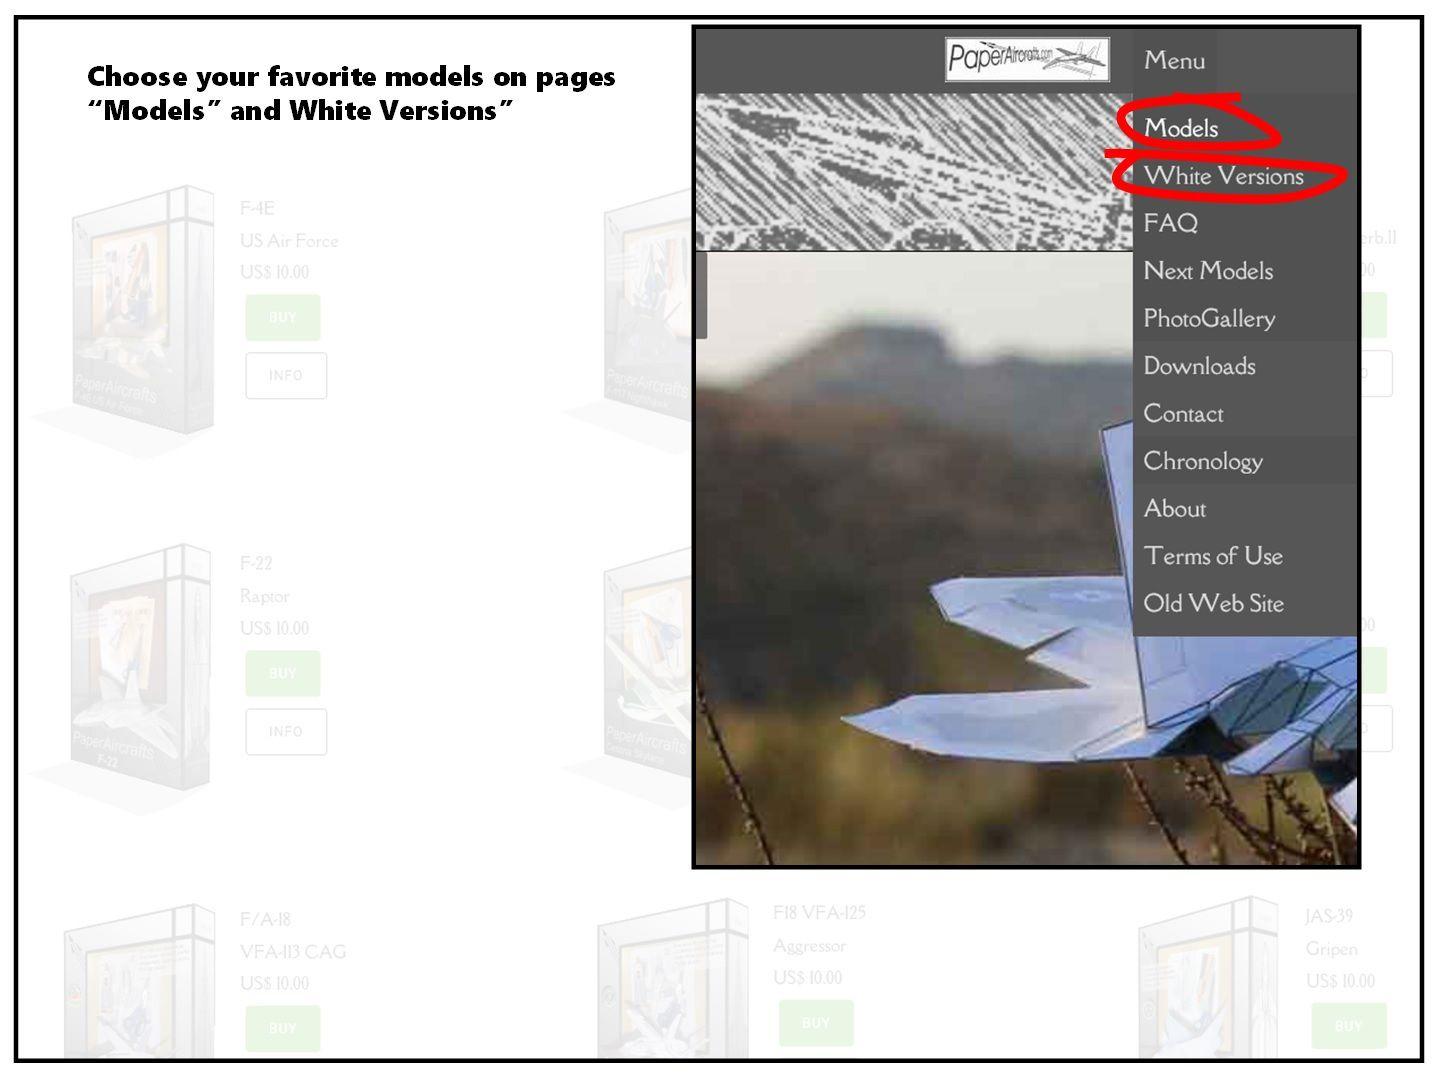 006 Awful Free Paper Airplane Design Printable Template Highest Quality  Designs-printable TemplatesFull